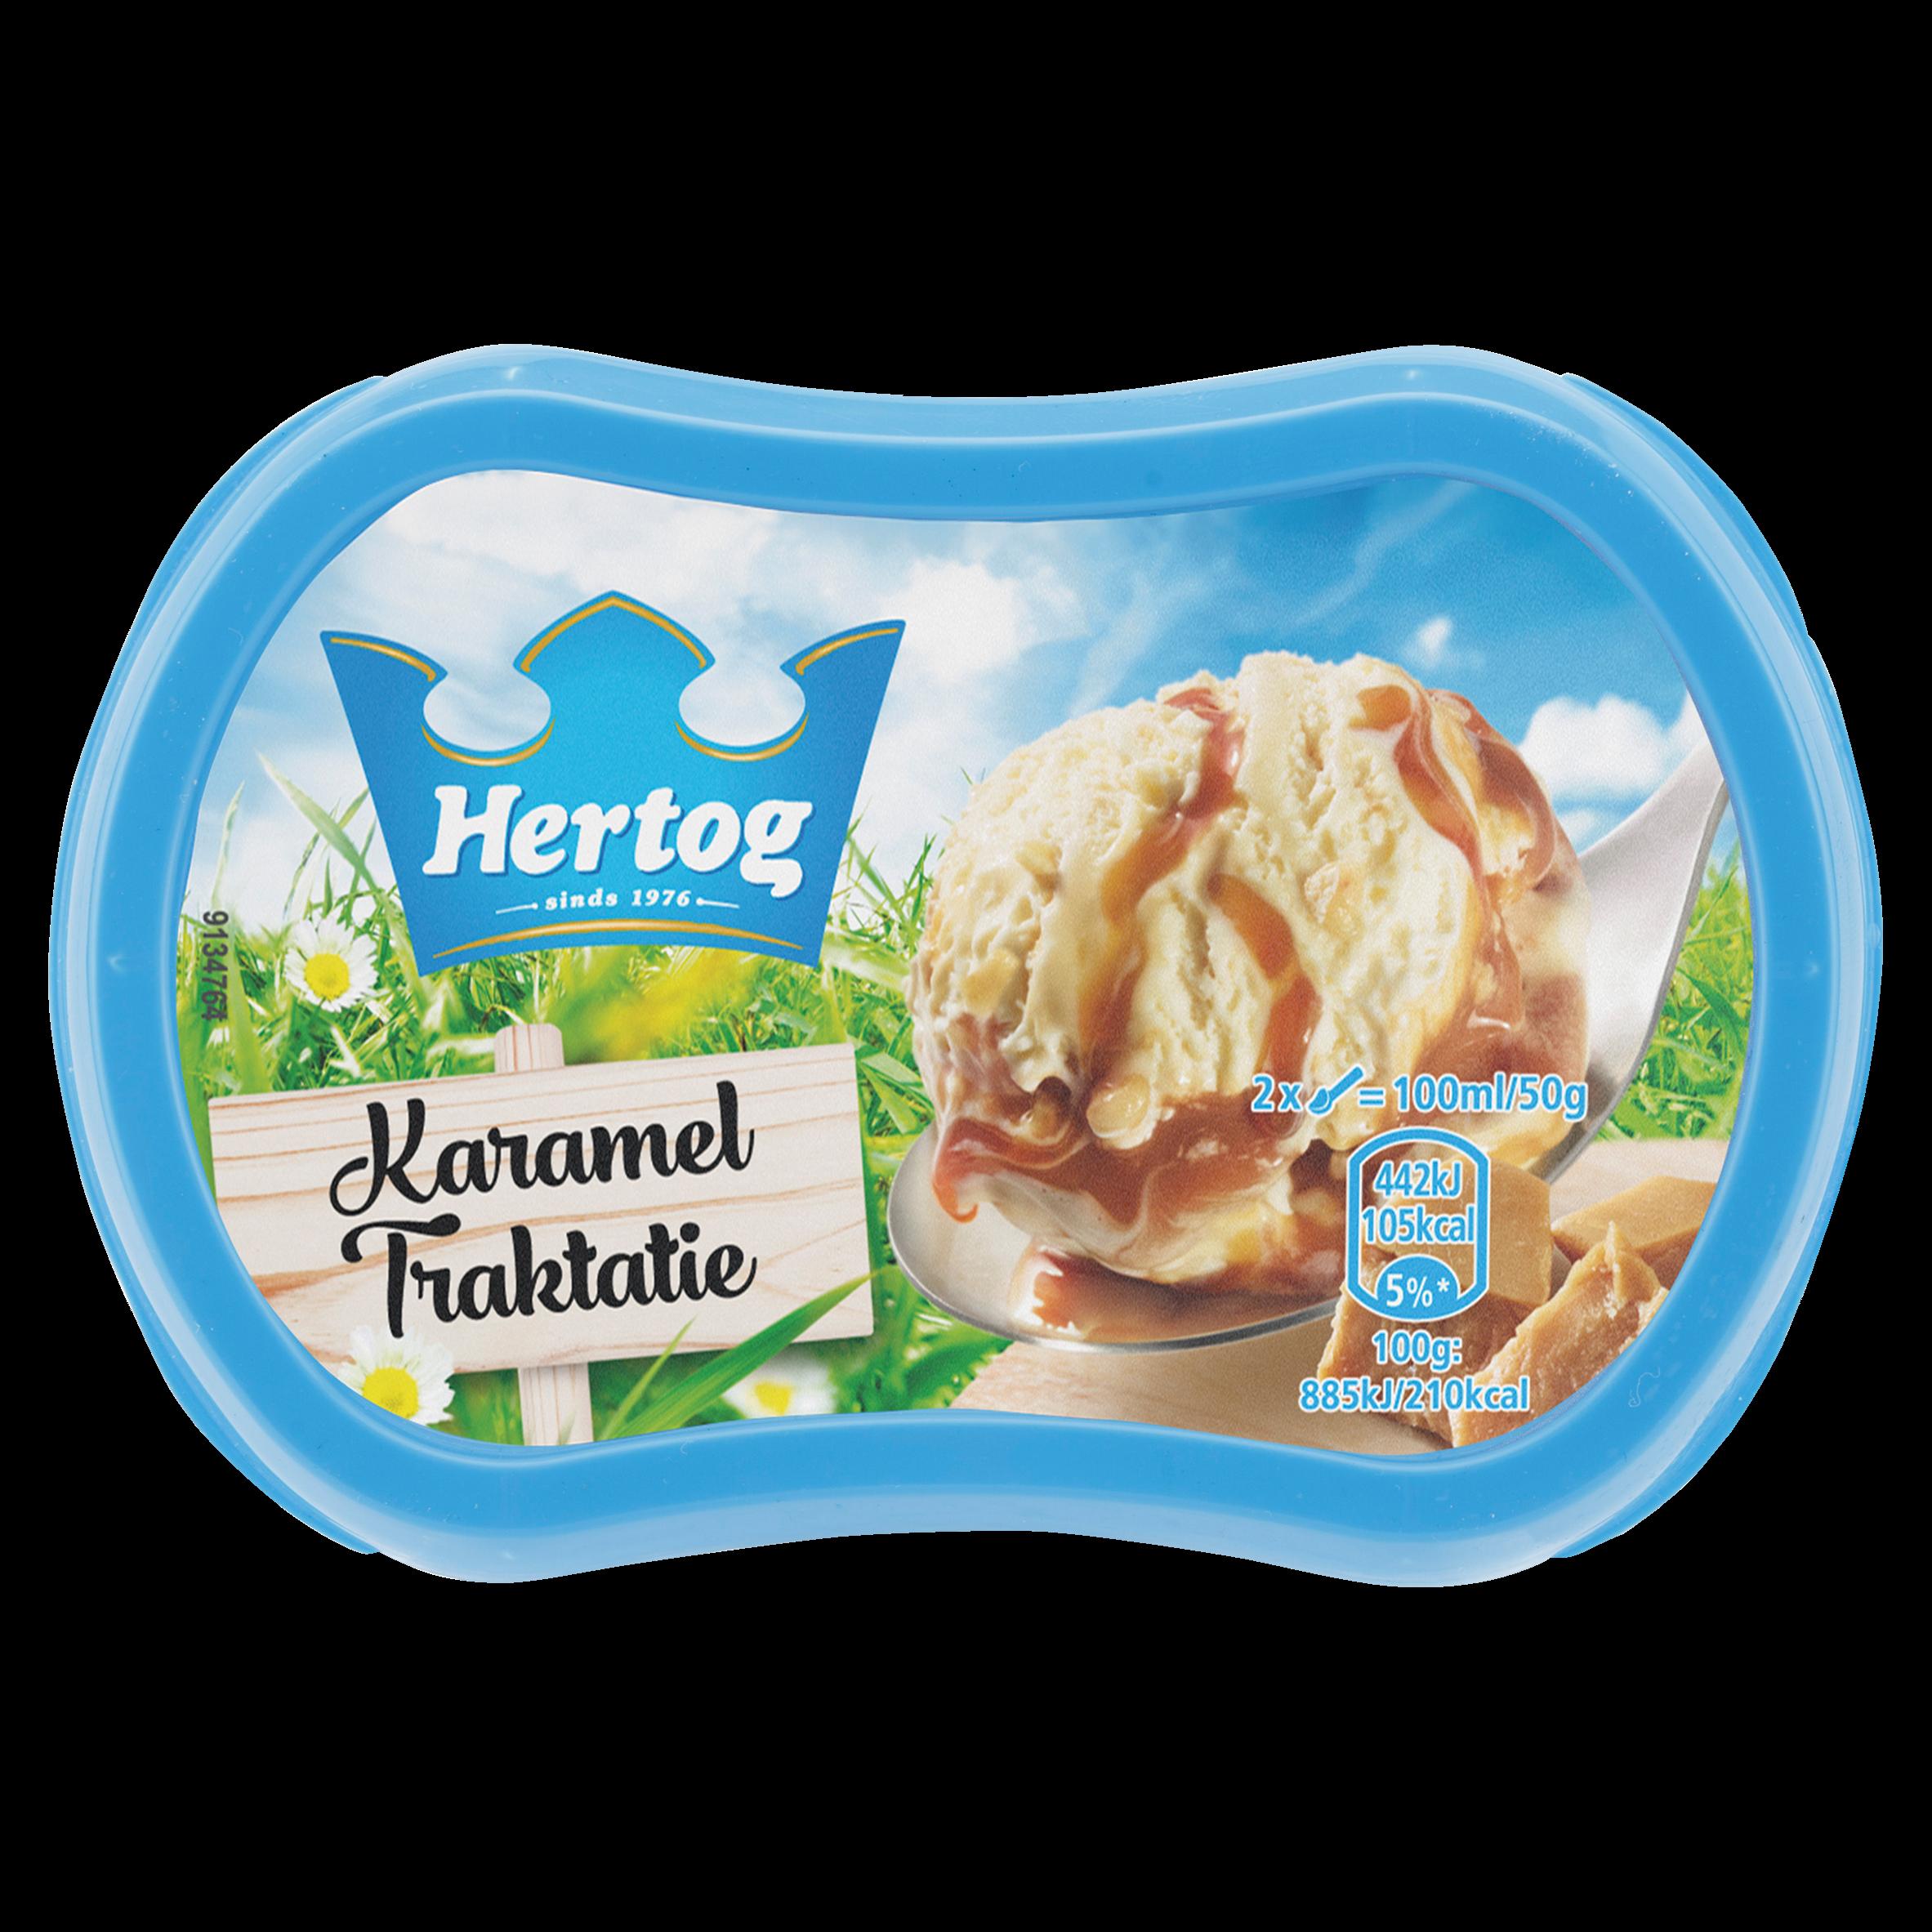 Hertog IJs Karamel Traktatie 200 ml